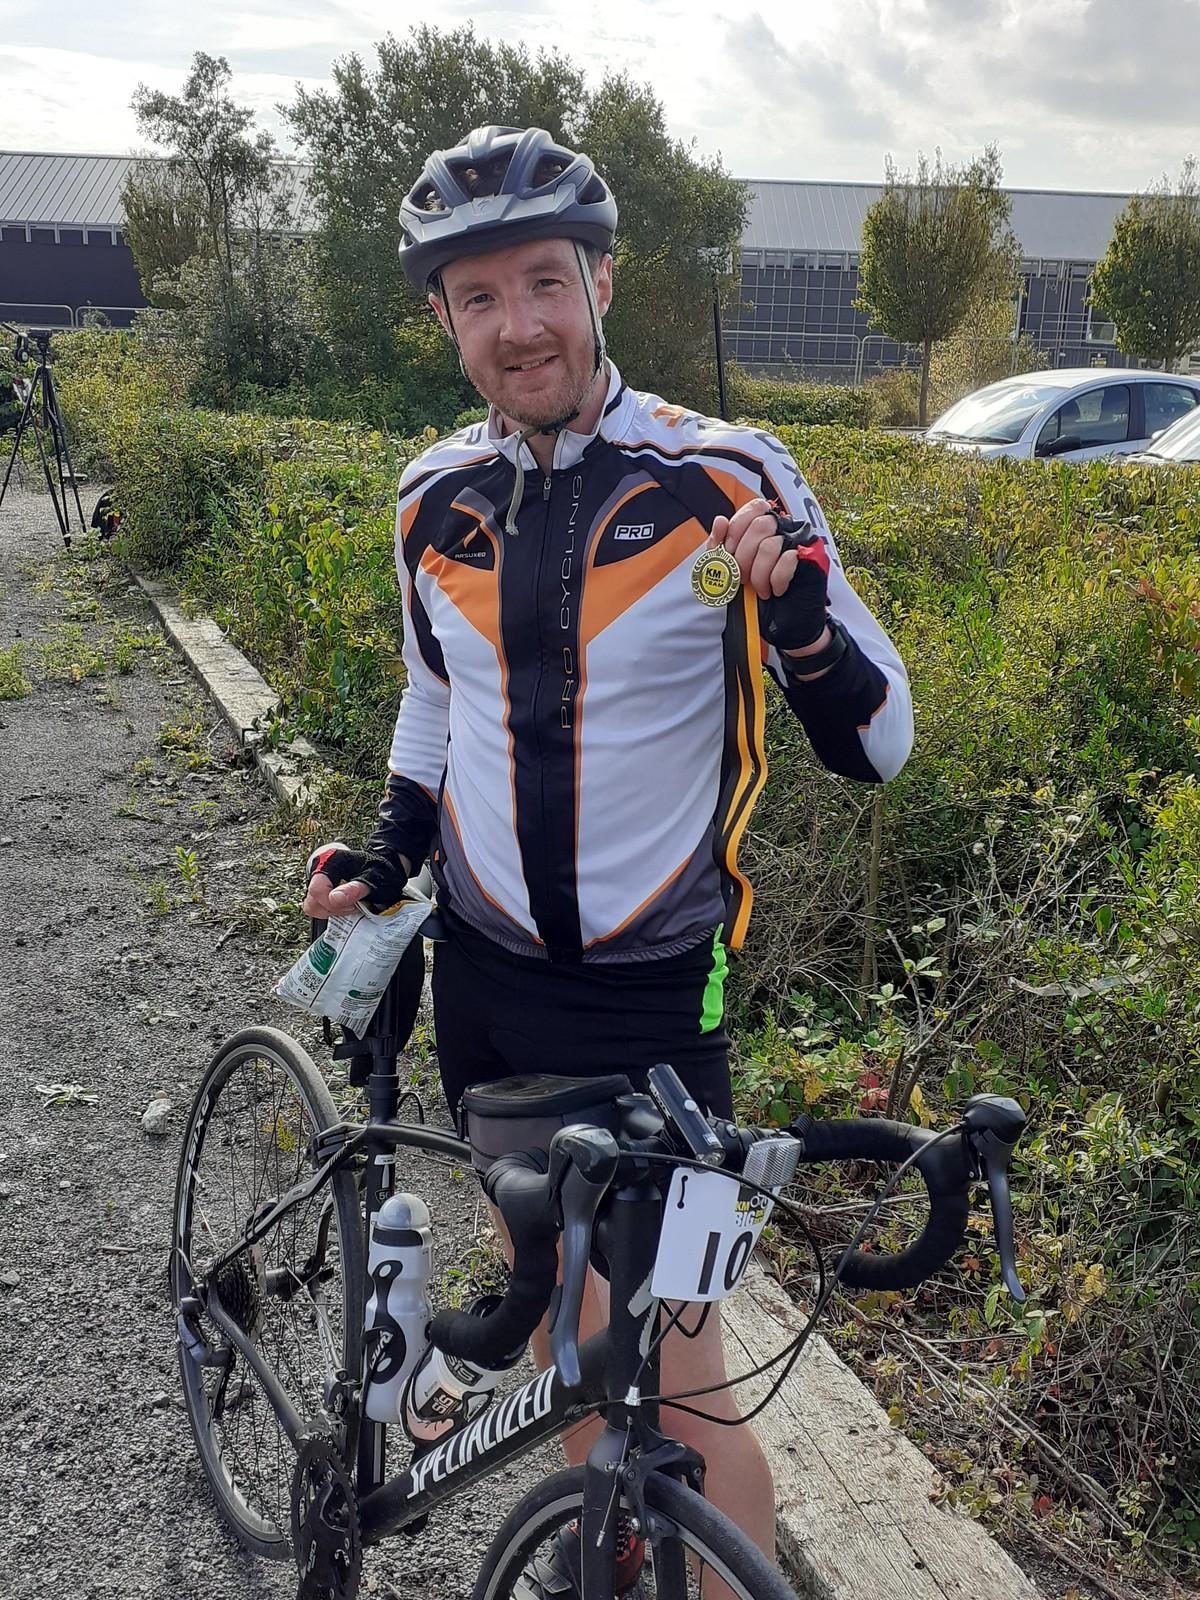 East Kent KM Big Bike Ride 2021 Starting Line